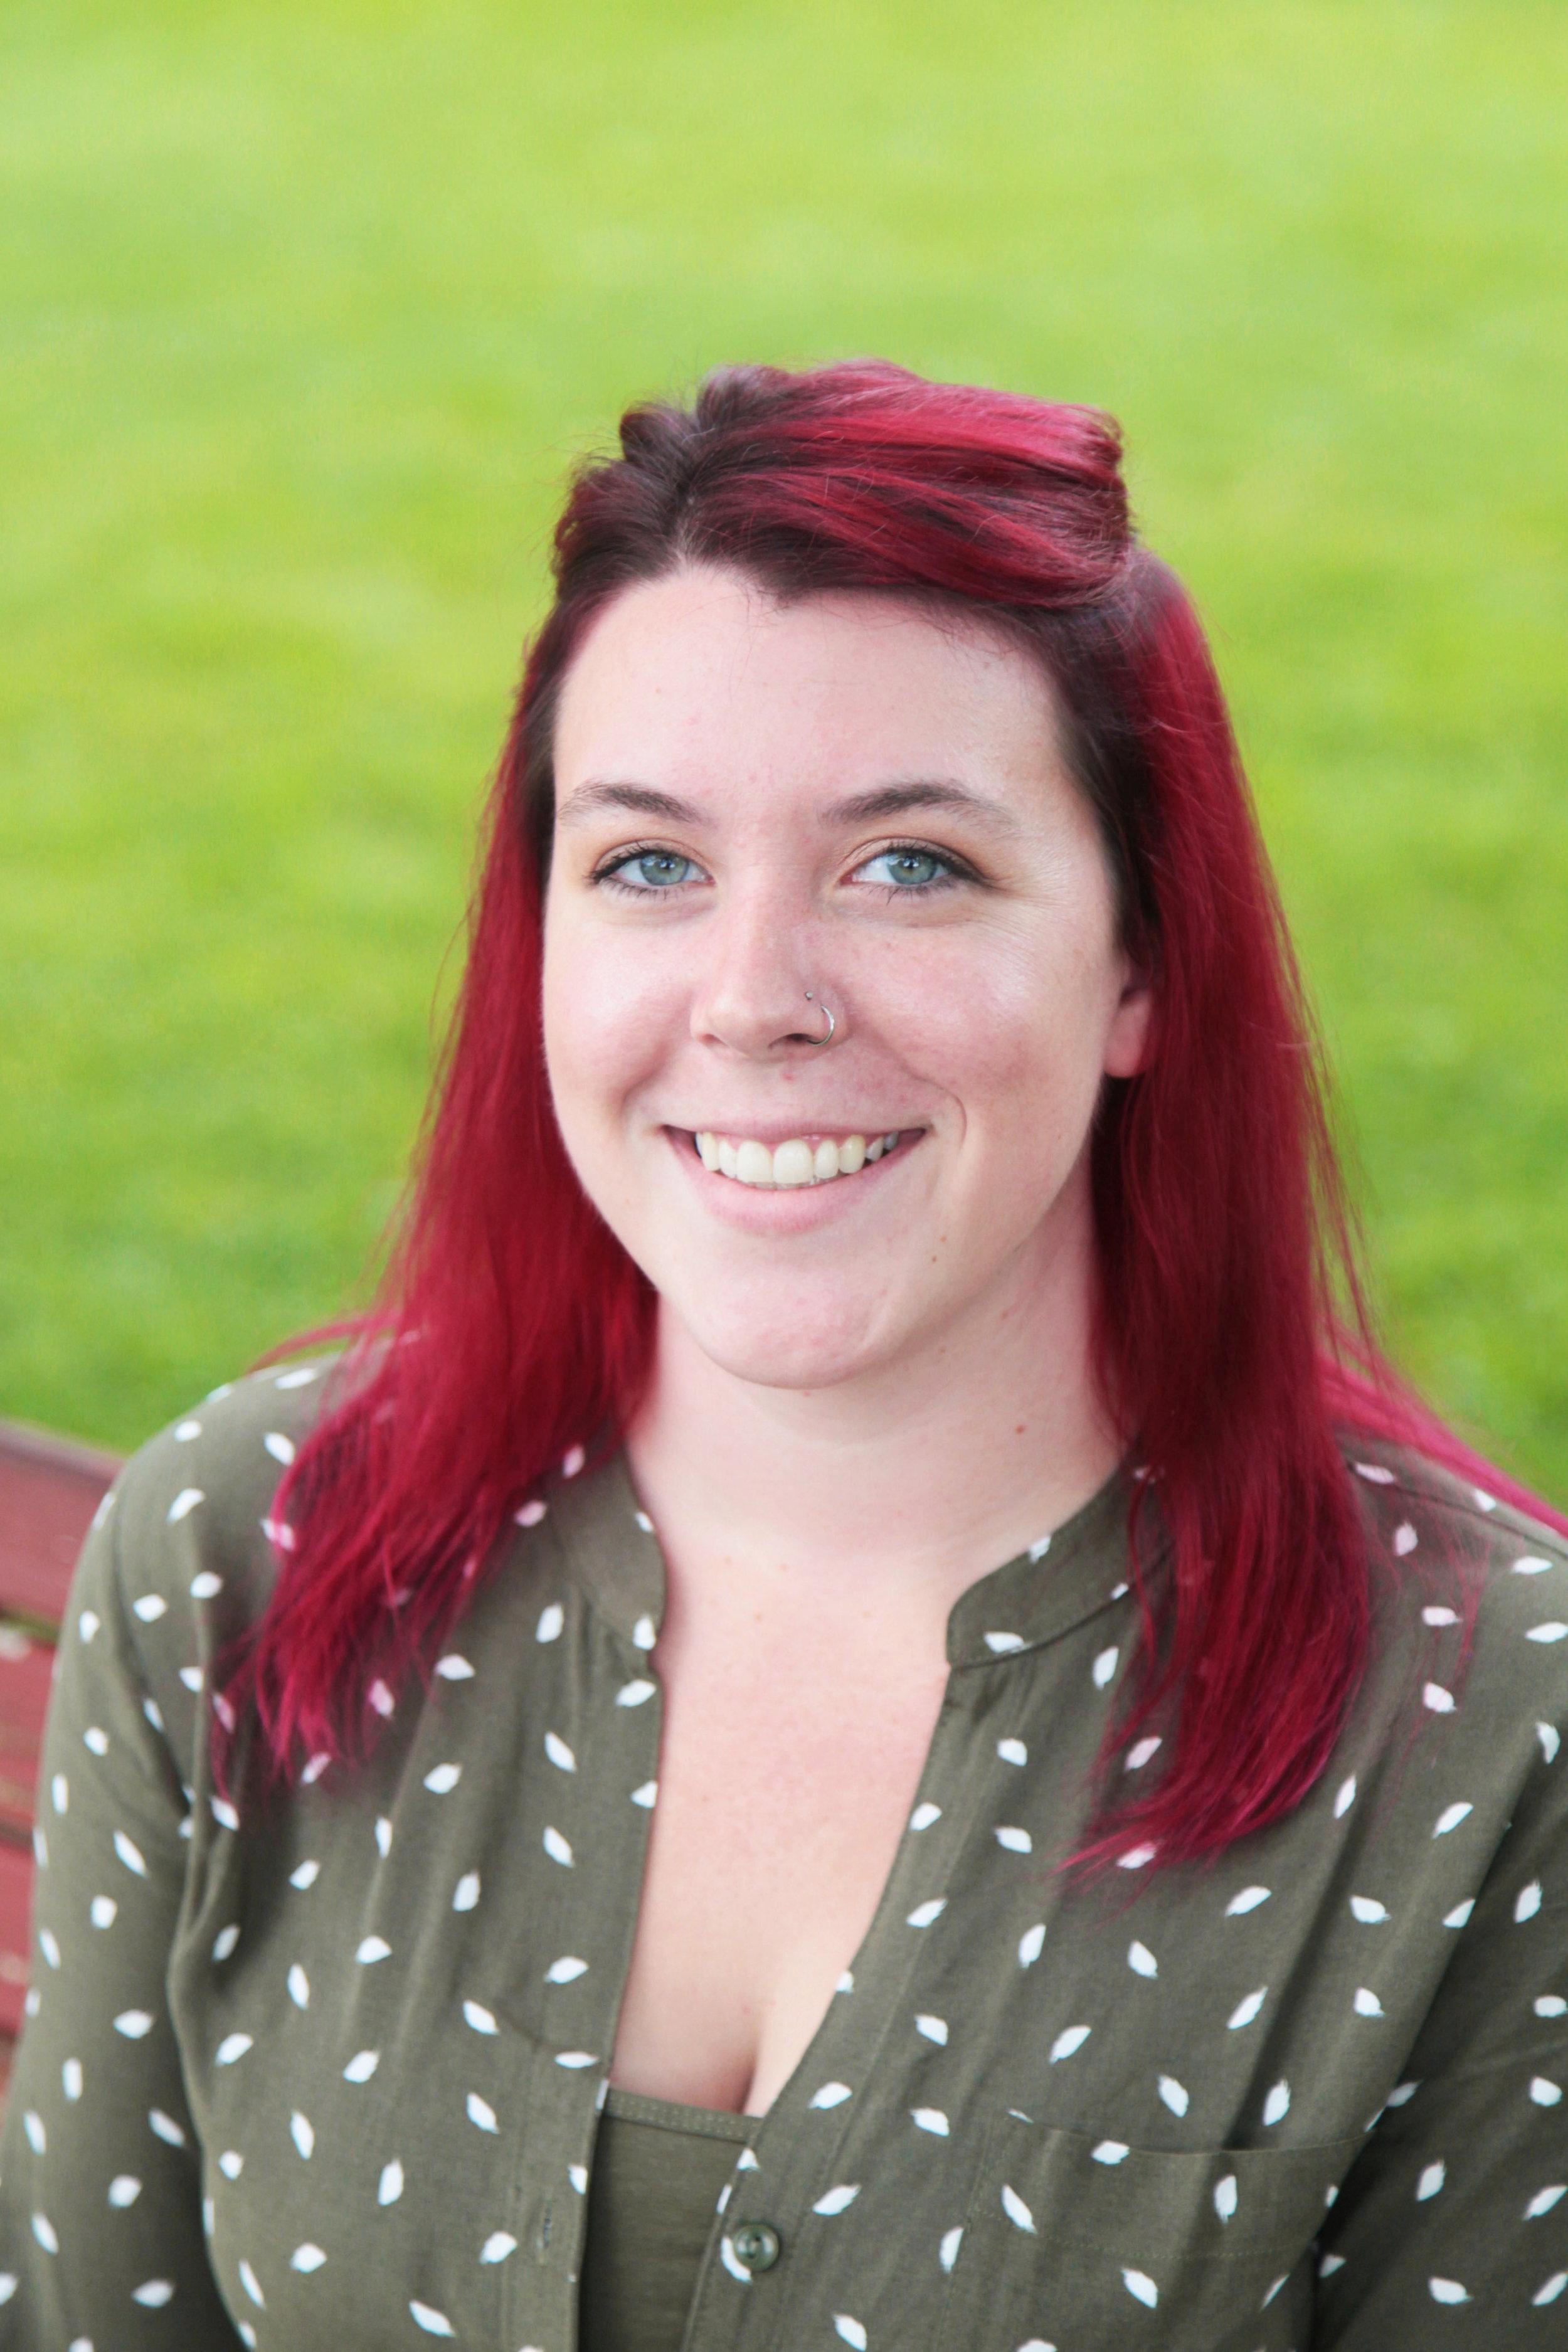 Lindsey Husky - Parent Aid/Foster Care Program Specialist